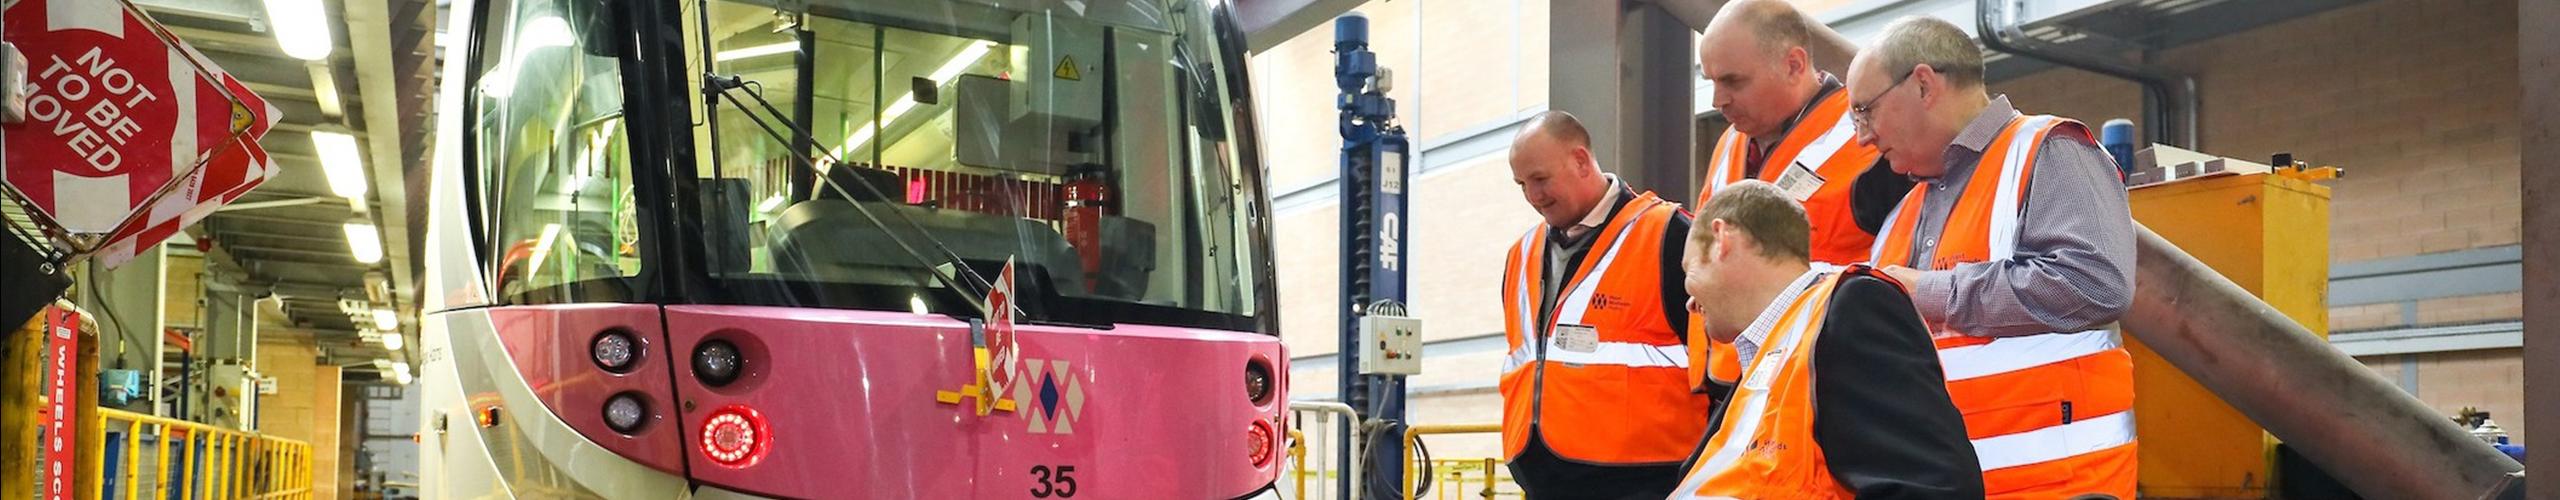 Skills Training Boost For Tram Recruitment